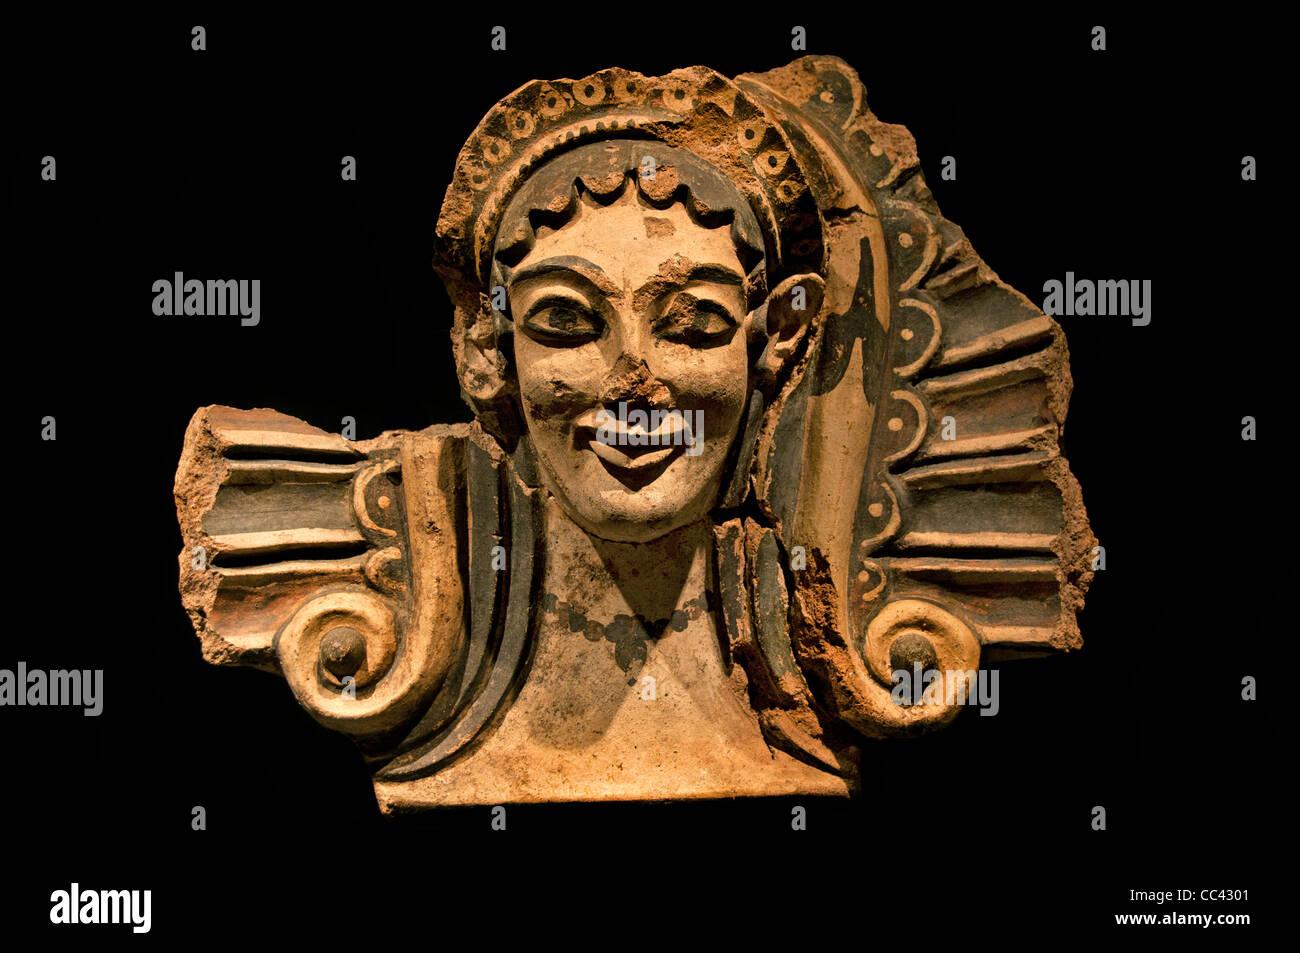 Gods demons Antefix maenads Veii temple Apollo Portonaccio Etruscan Italy Etruria 500 BC - Stock Image